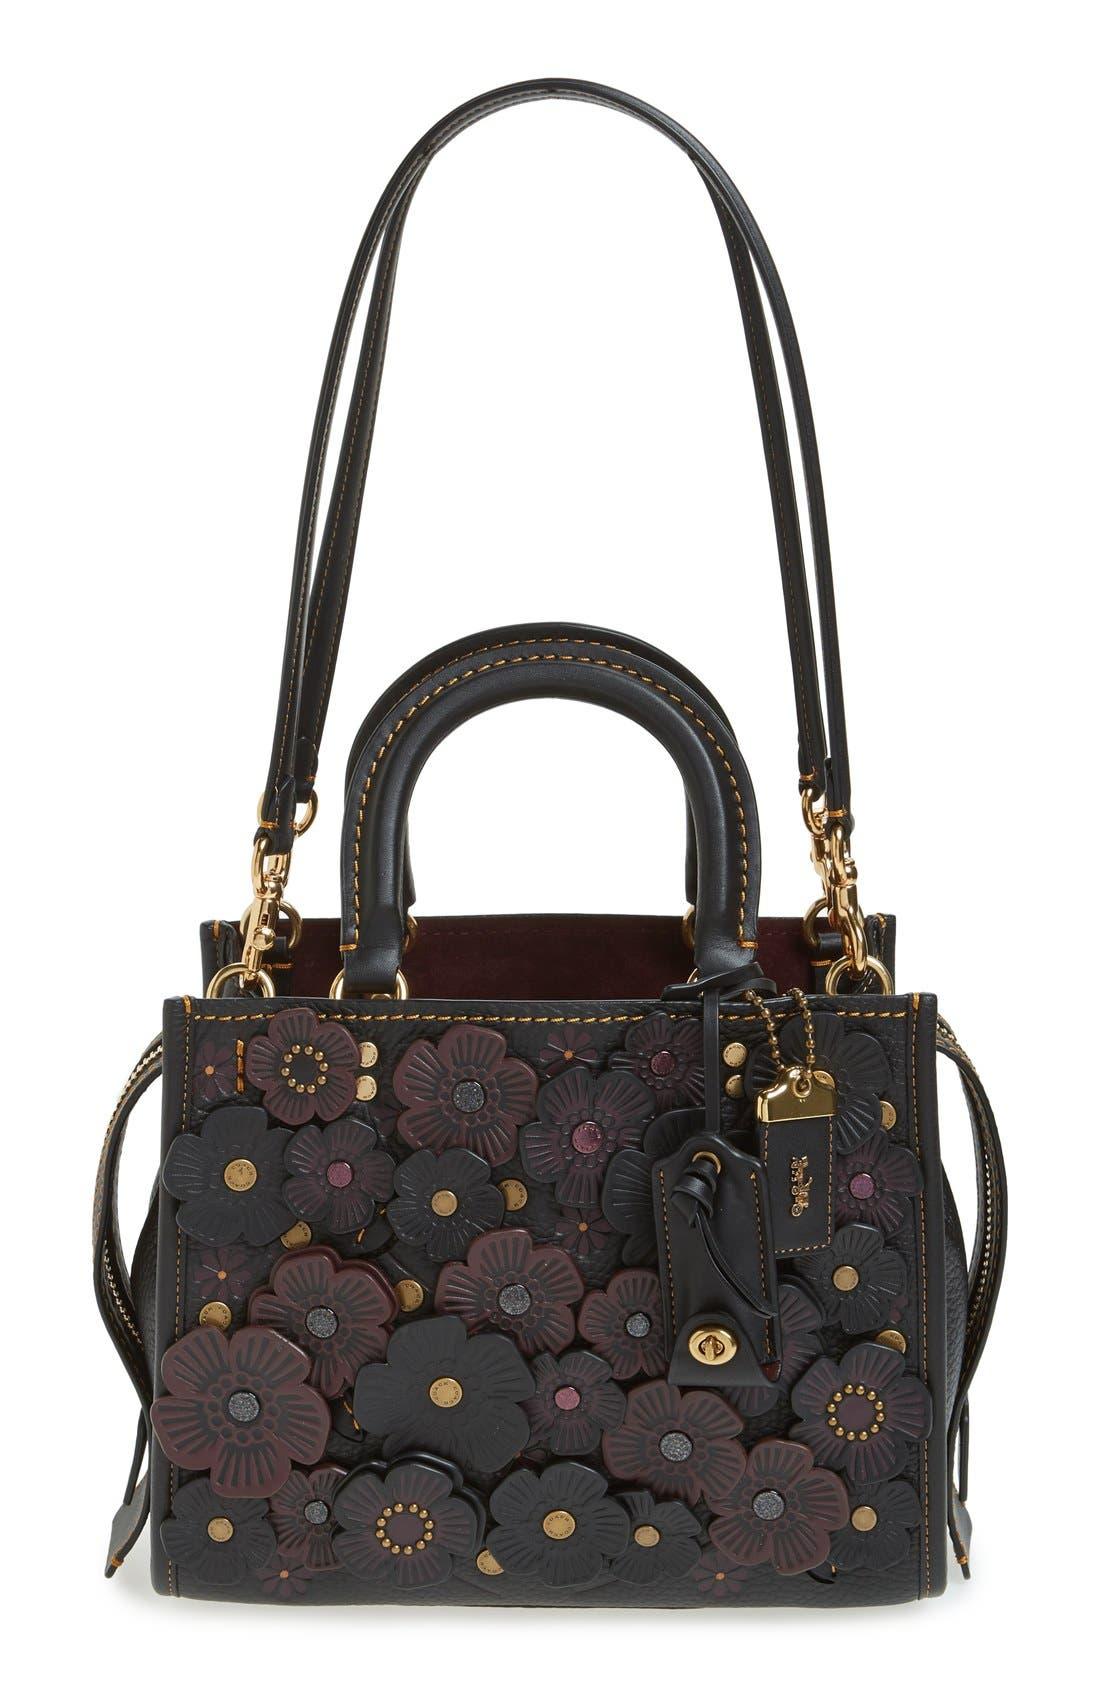 COACH 1941 Rogue 25 Tea Rose Appliqué Leather Crossbody Bag